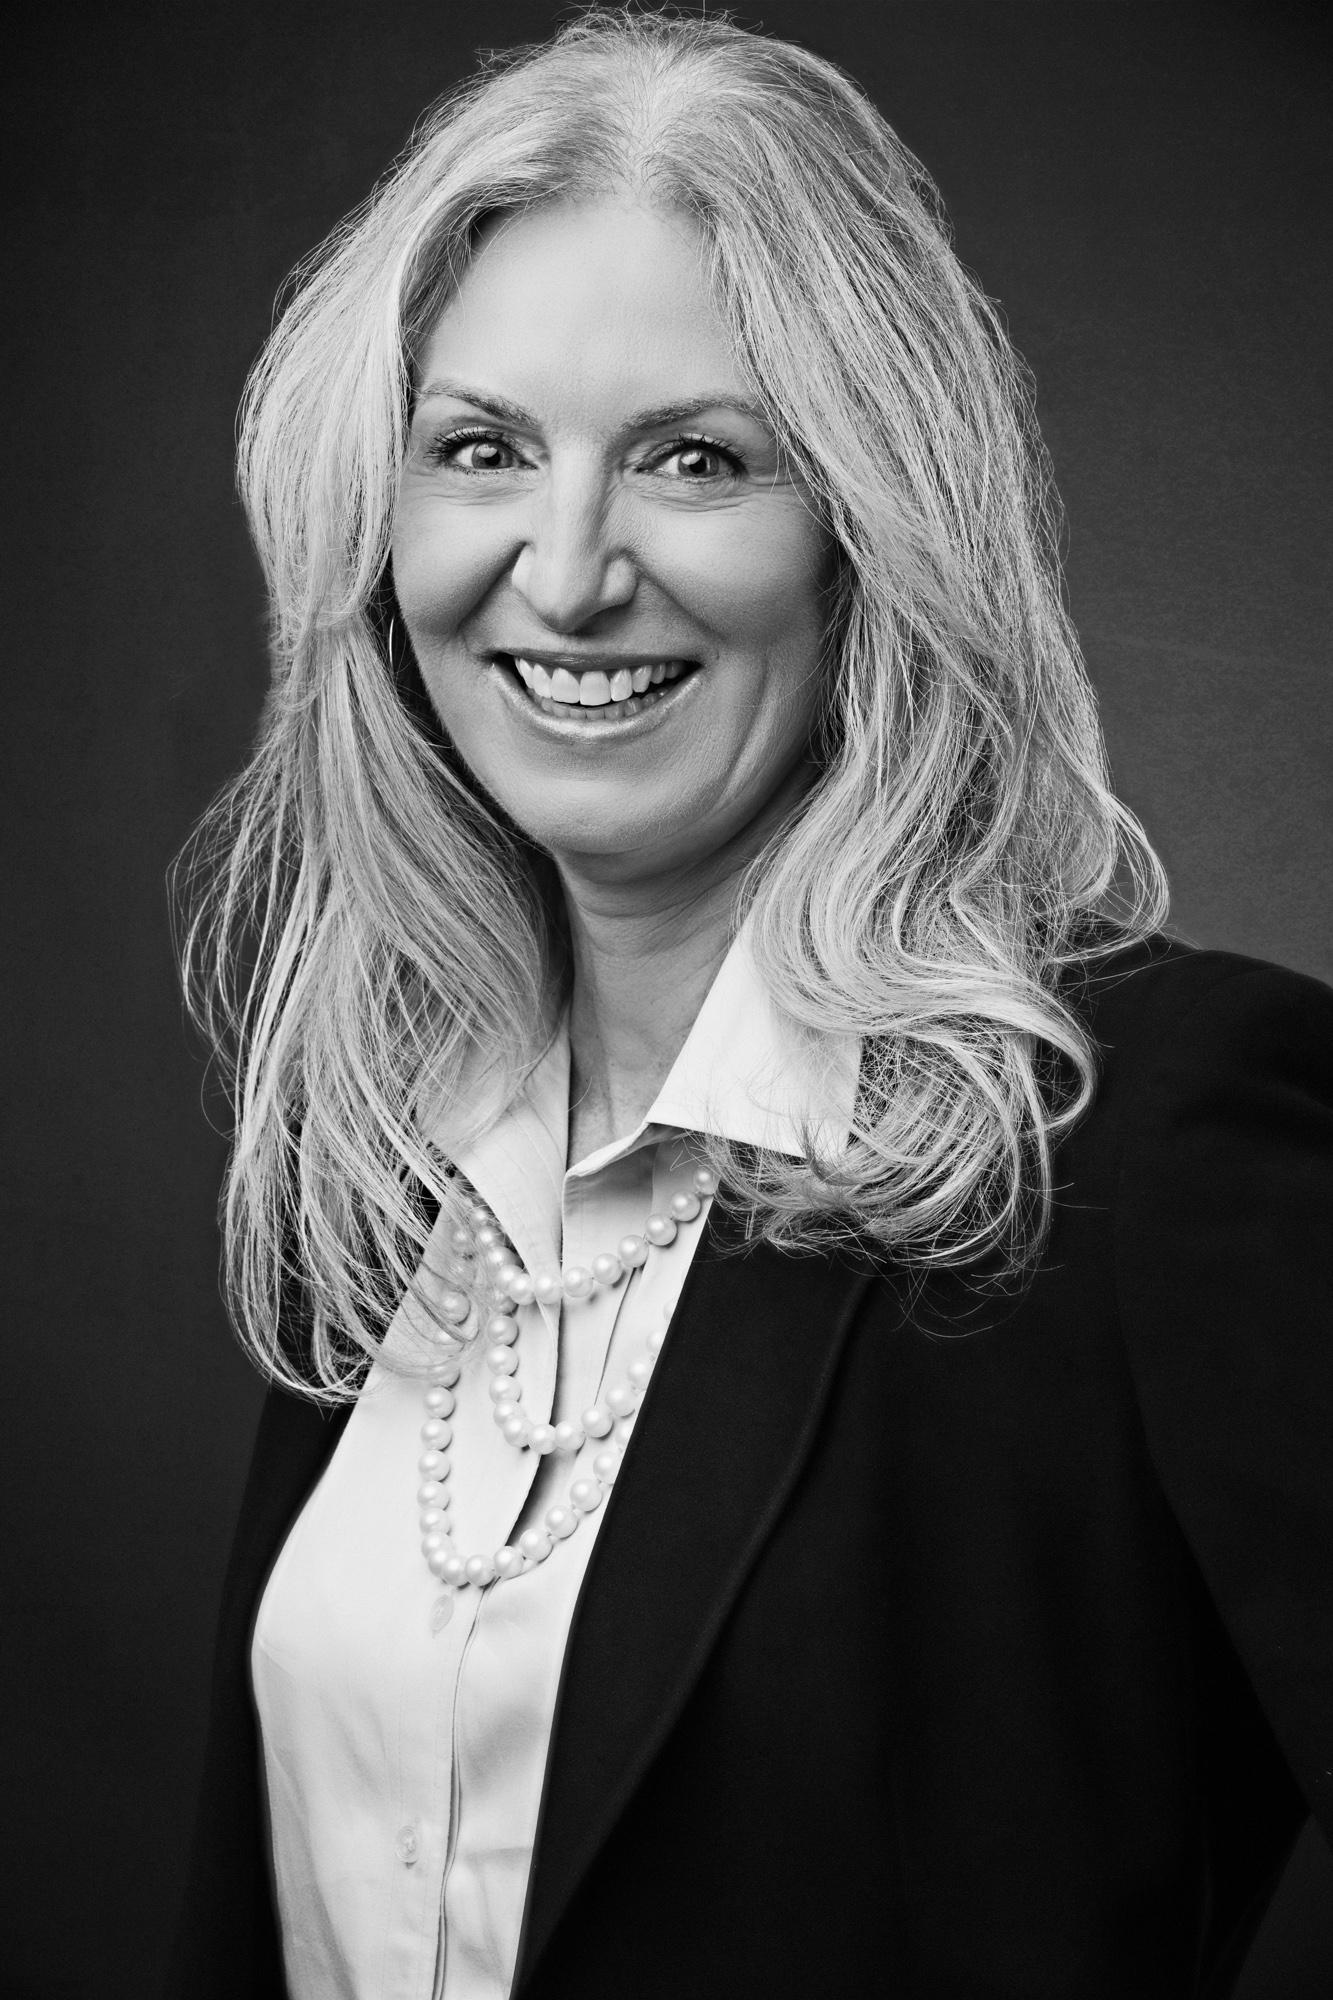 Beth Brady, CMO of The Principal Financial Group